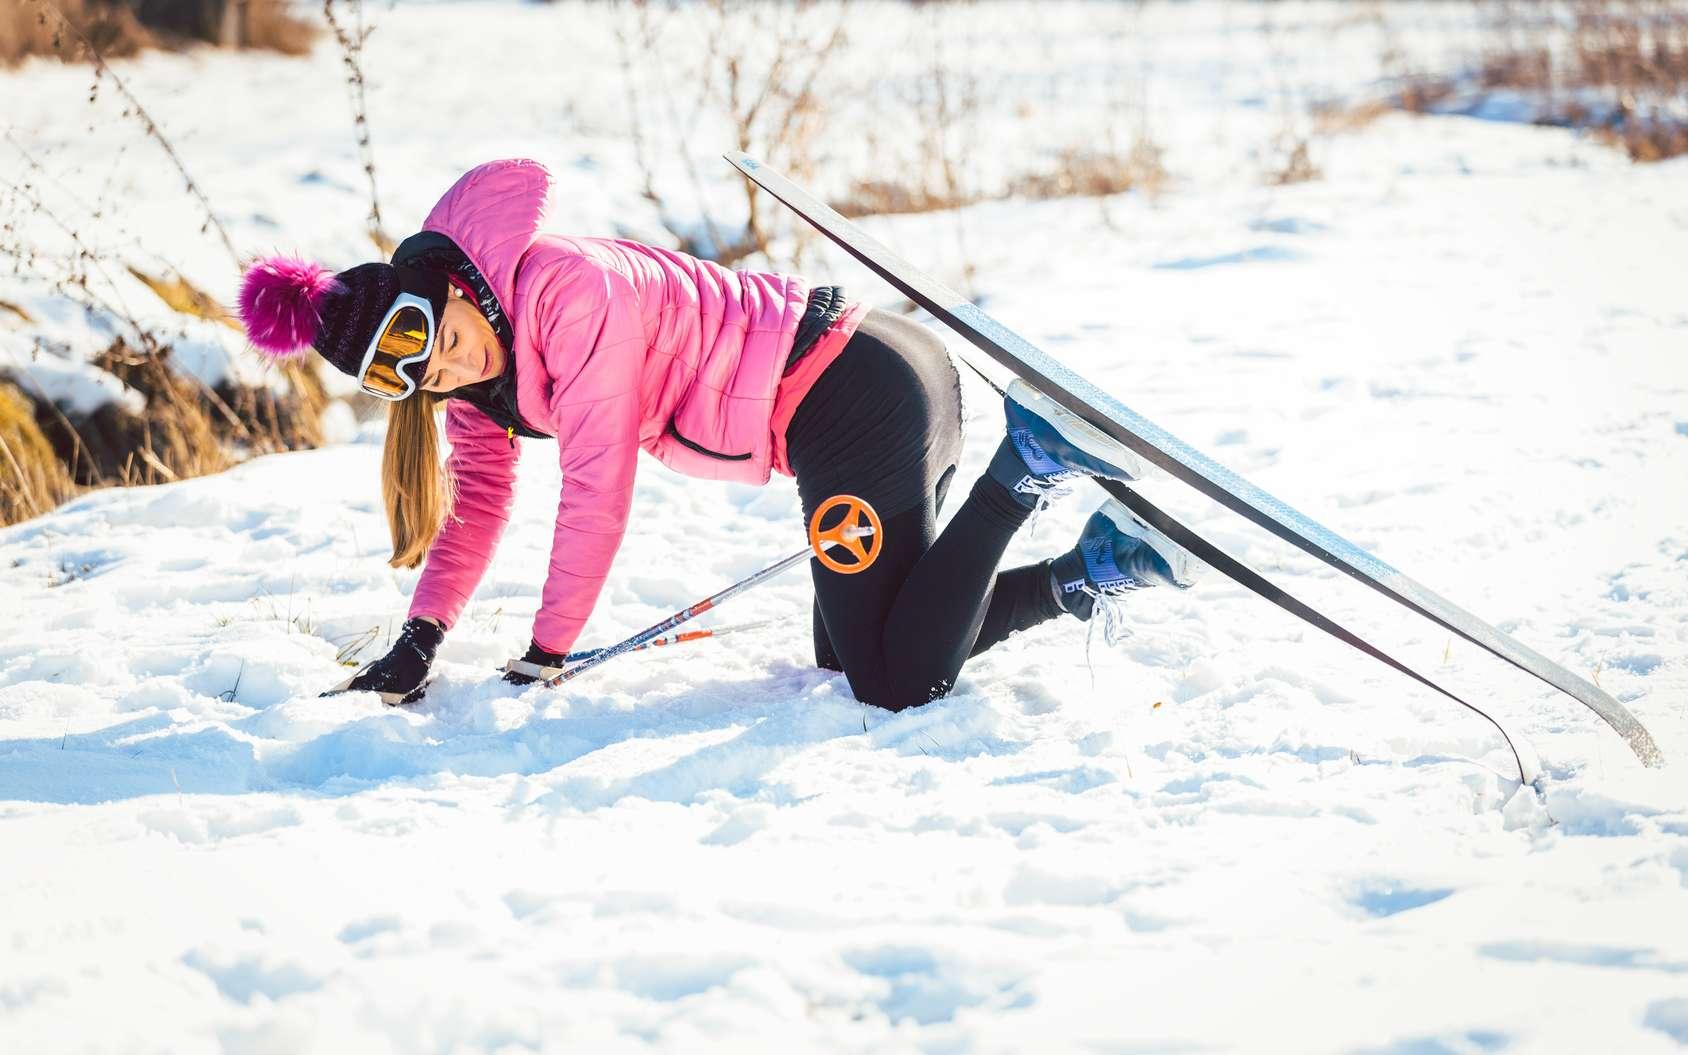 Comment éviter les blessures au ski ? © Kzenon, Fotolia